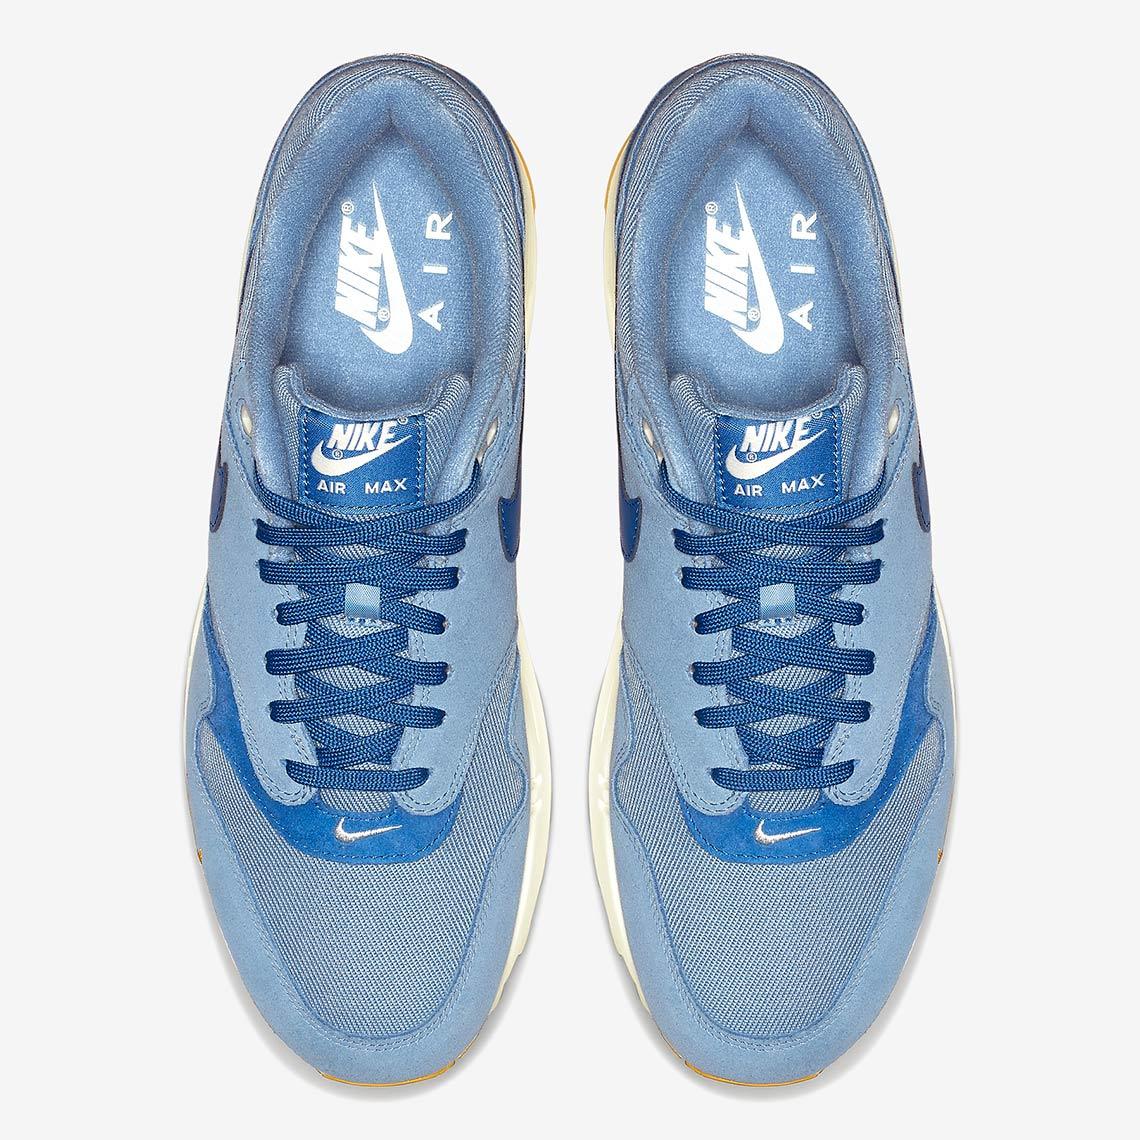 bc72010311 Nike Air Max 1 Mini Swoosh 875844-404 + 875844-007 Release Info ...